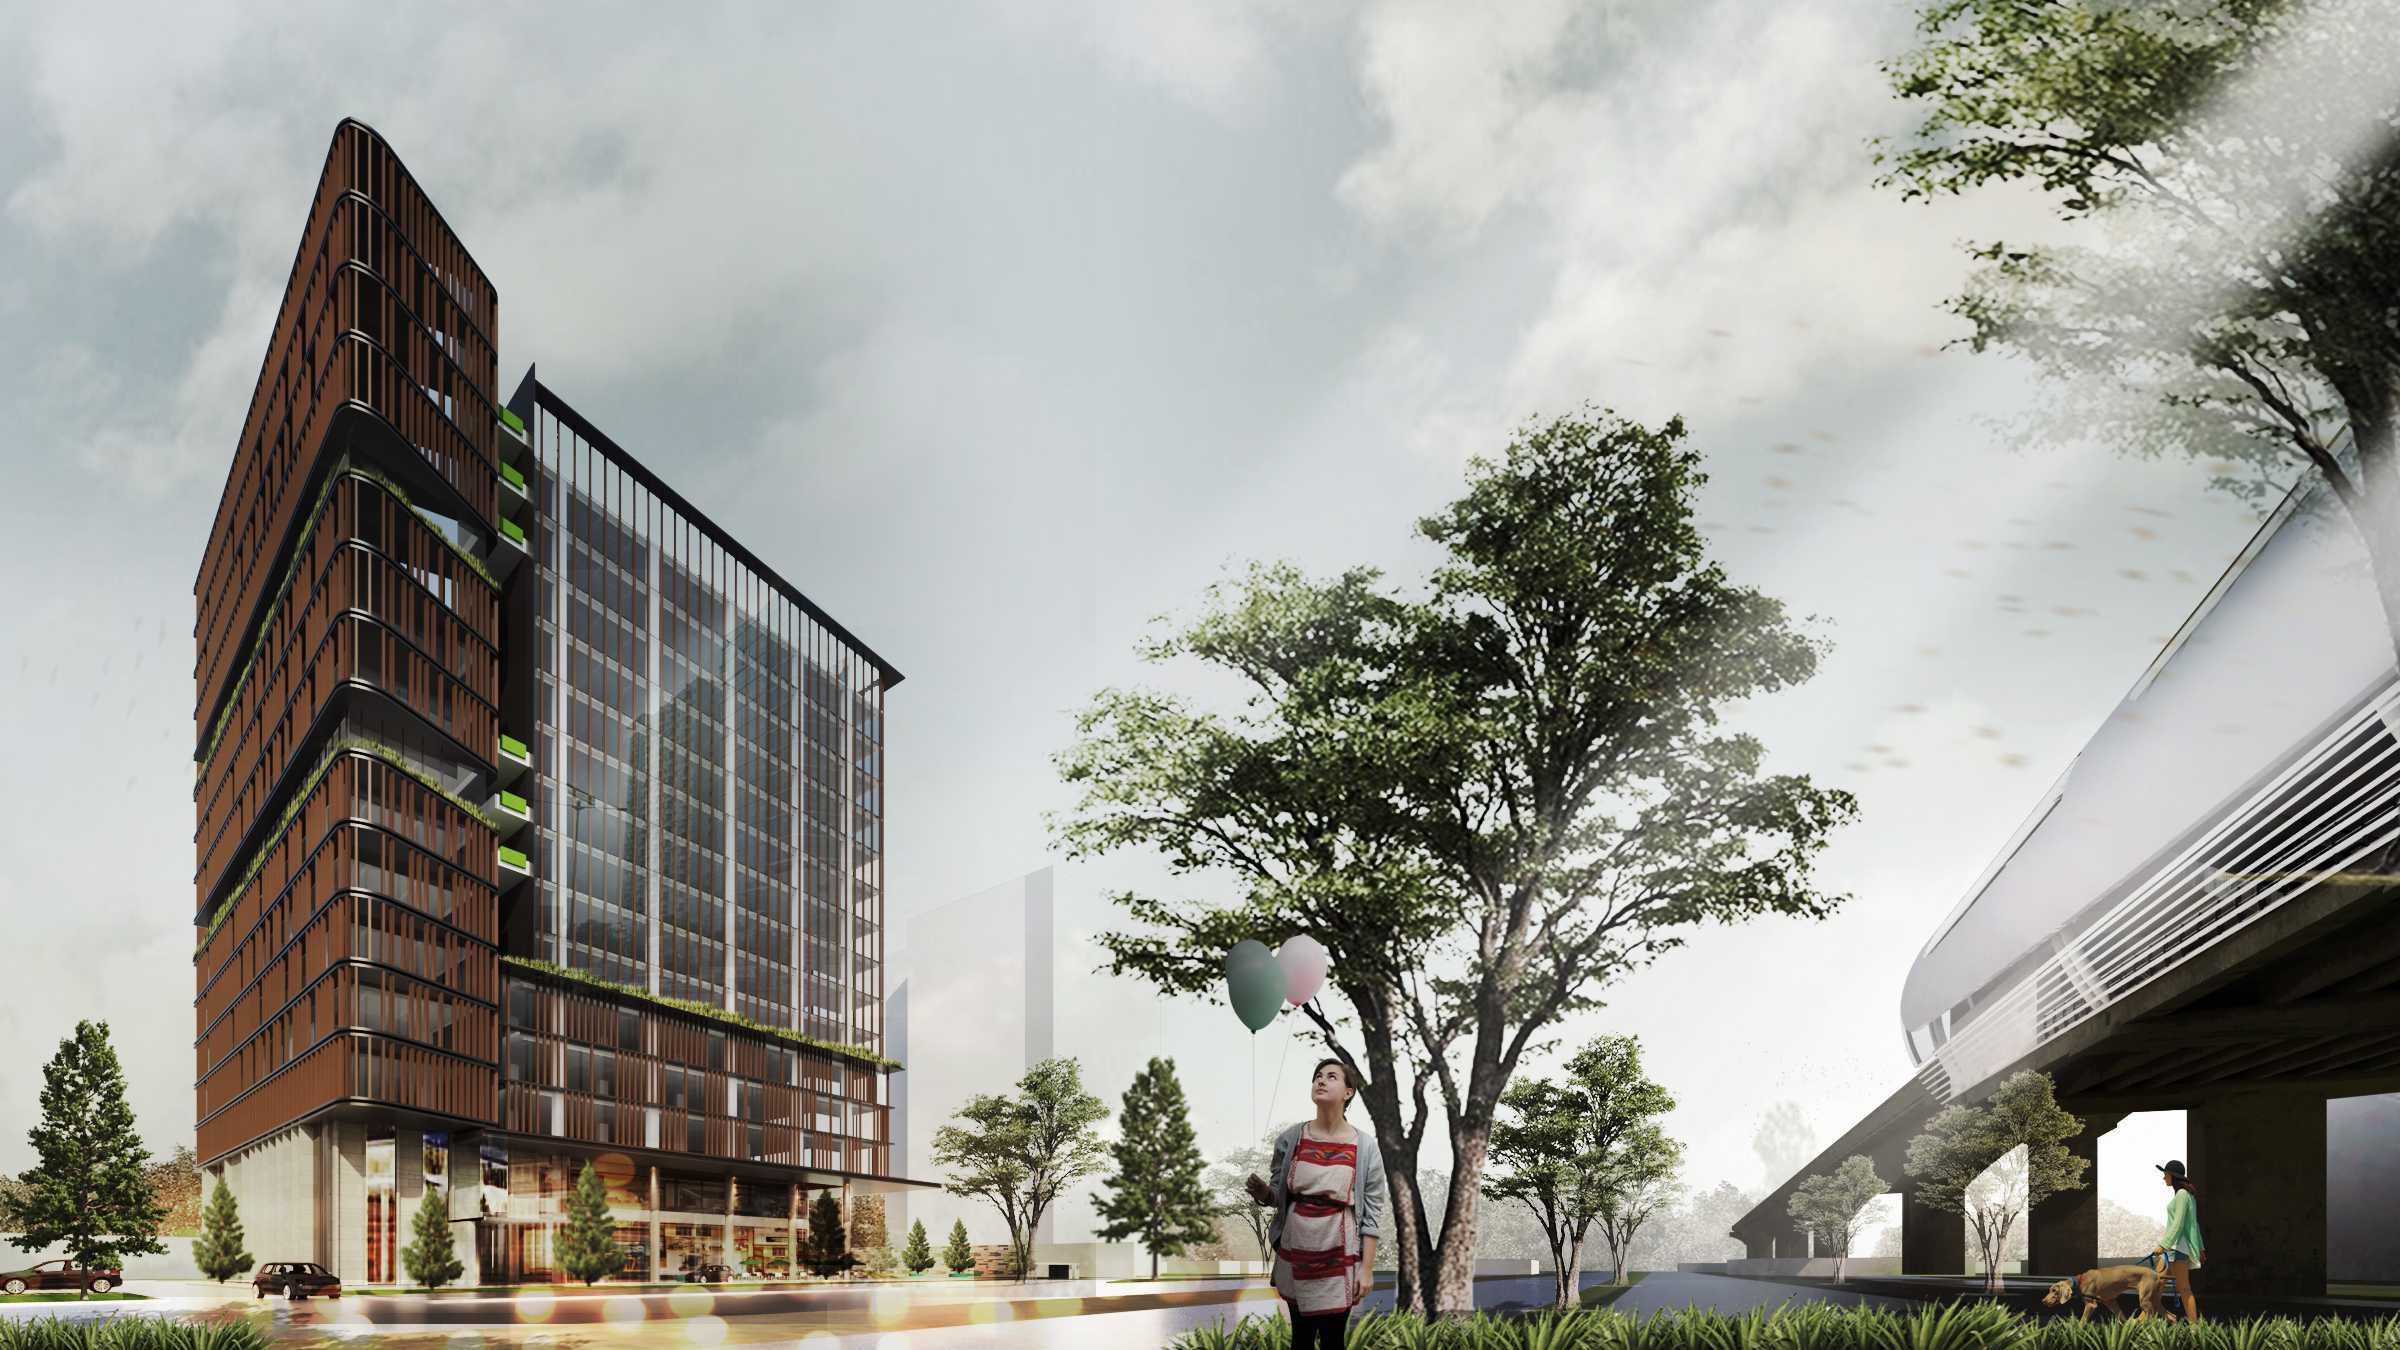 "Moi Architects Mt Office ""the Urban Canopy"" Jakarta, Daerah Khusus Ibukota Jakarta, Indonesia Jakarta, Daerah Khusus Ibukota Jakarta, Indonesia Moi-Architects-Mt-Office-The-Urban-Canopy   59034"